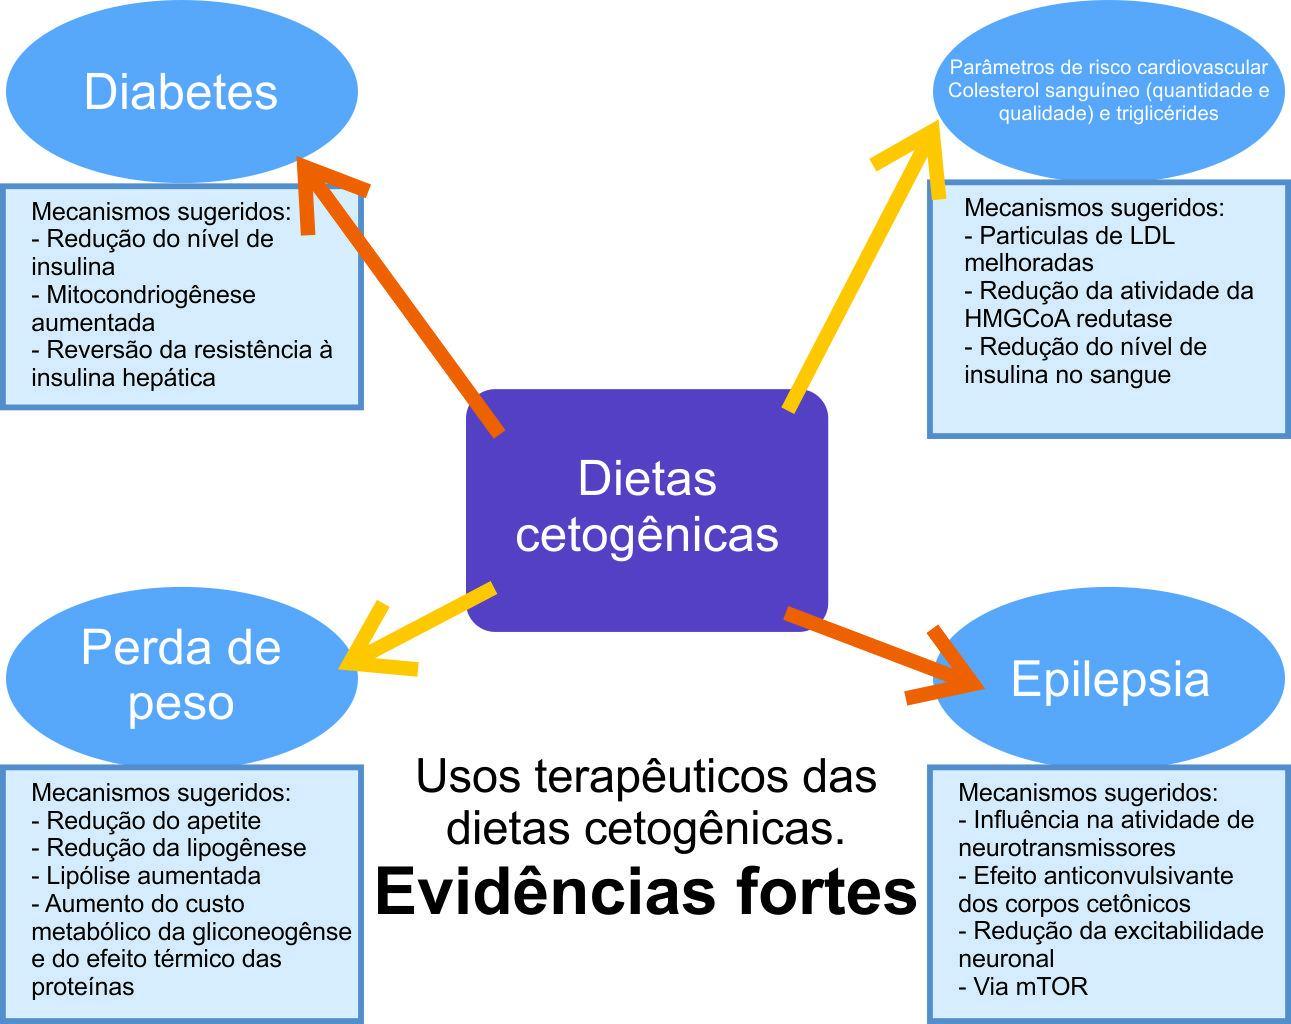 dieta%2Bcetogenica%2B-%2Bevidencias%2Bfortes.jpg